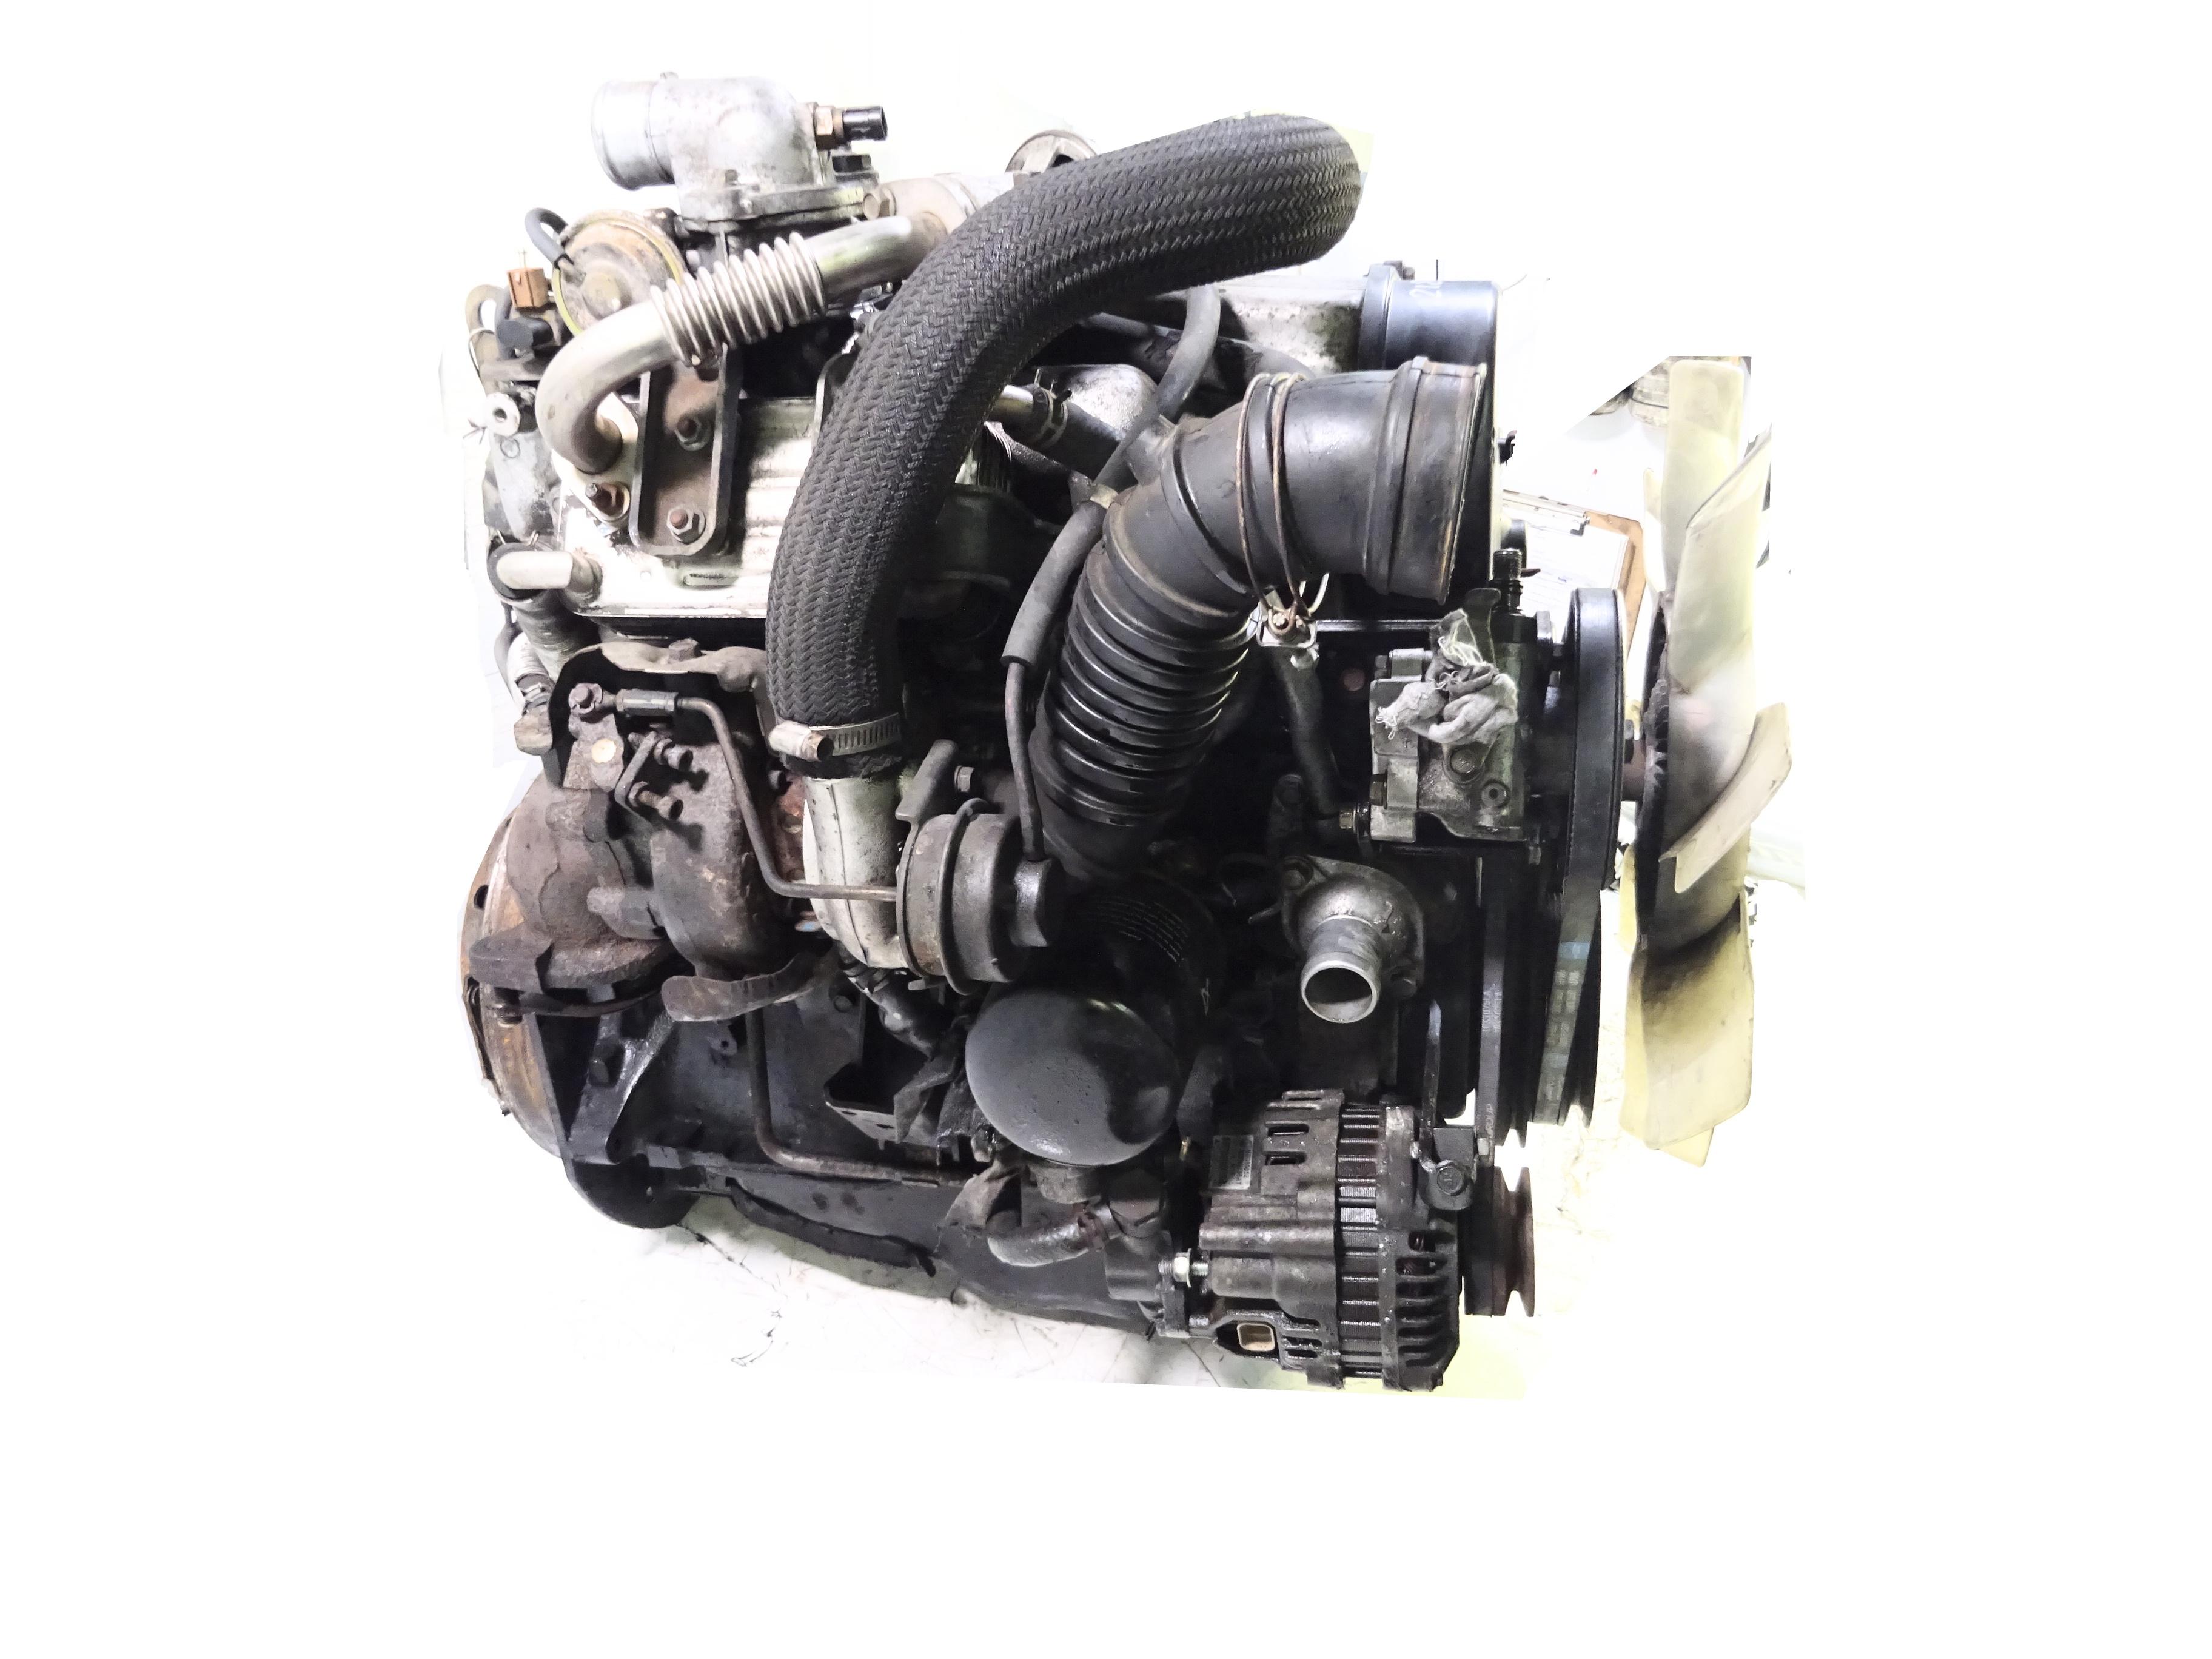 Motor 2006 für Mitsubishi Pajero Shogun 2,5 TDi Diesel 4D56 4D56-T